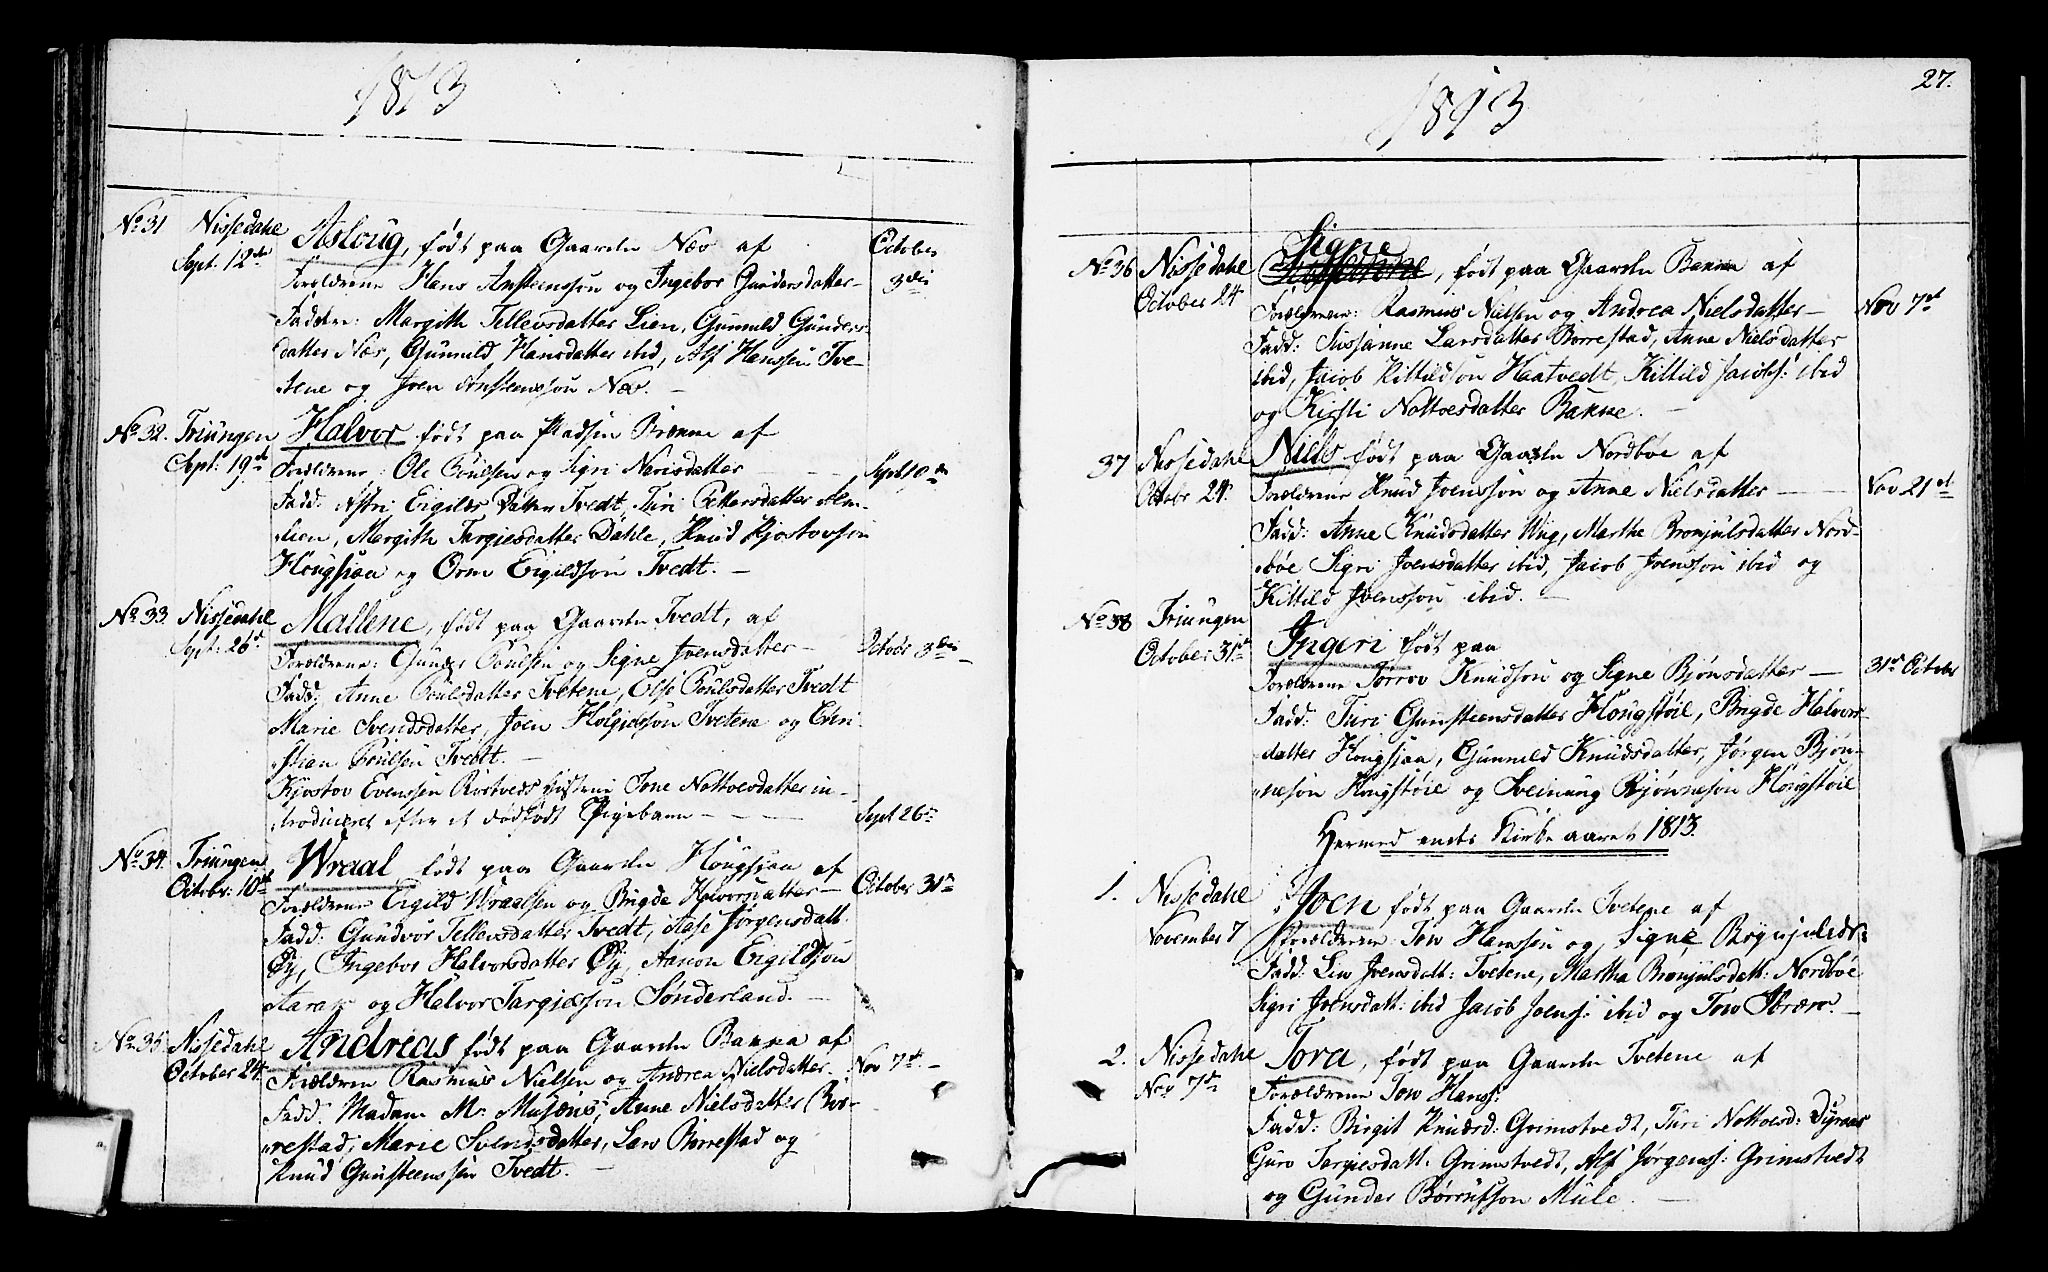 SAKO, Nissedal kirkebøker, F/Fa/L0001: Ministerialbok nr. I 1, 1811-1814, s. 27